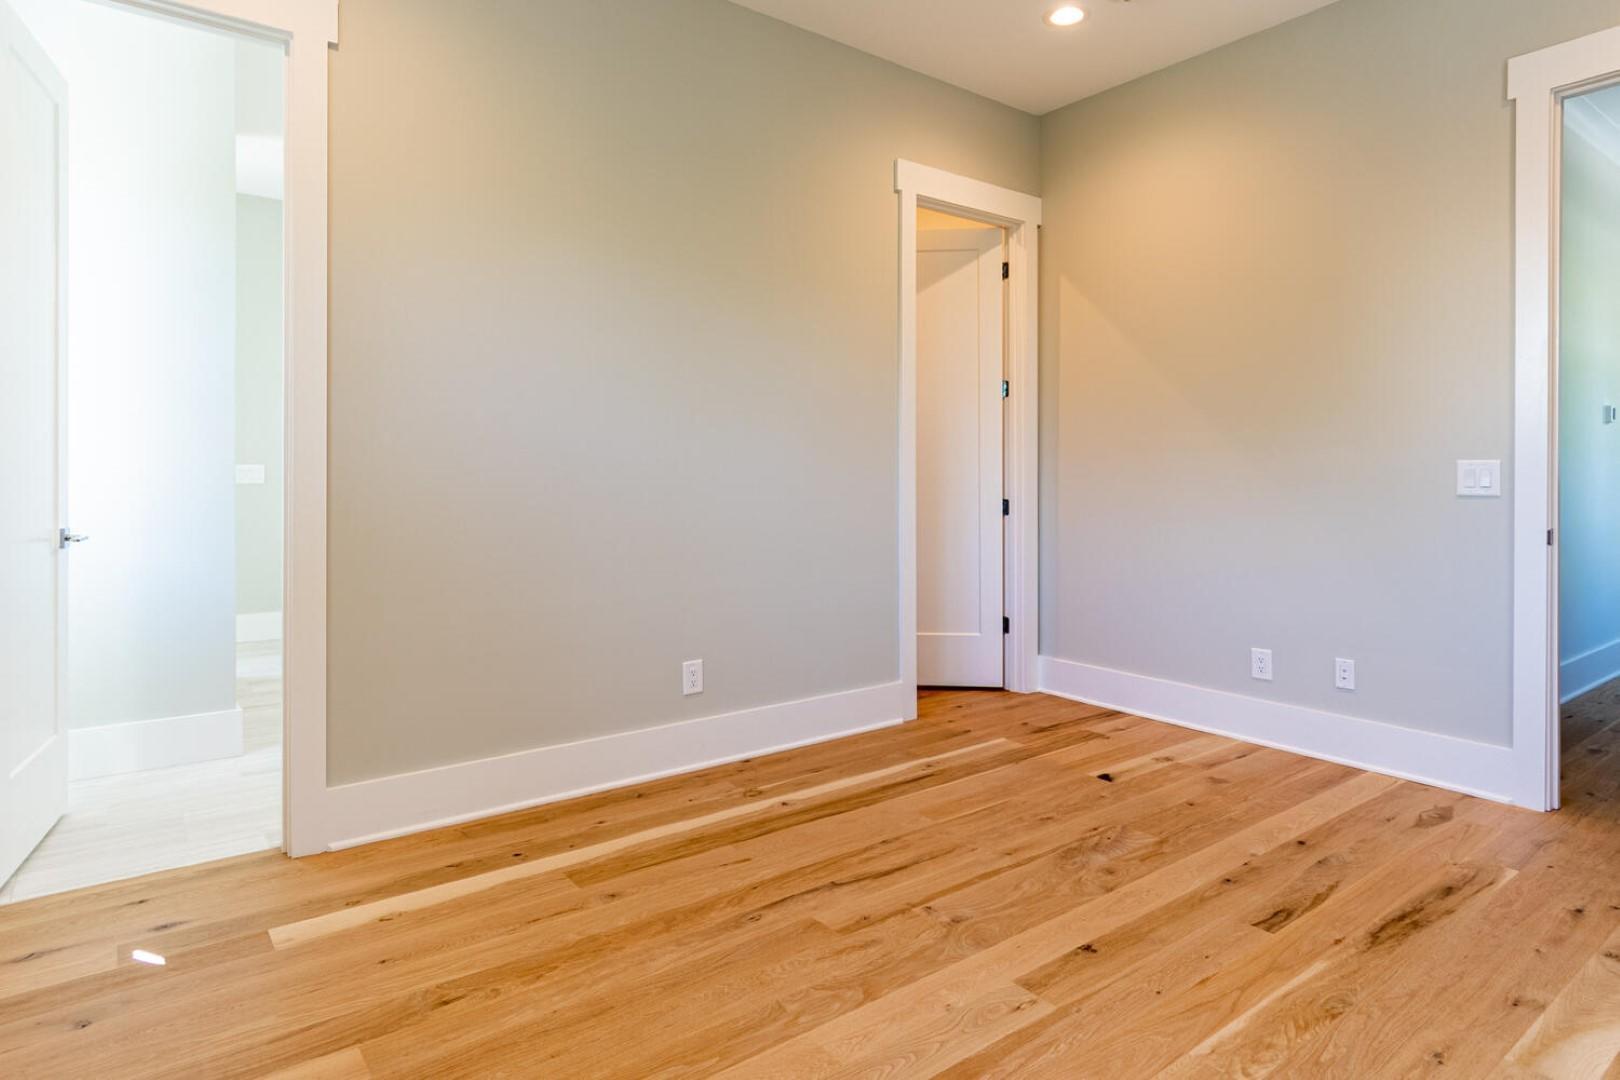 Scanlonville Homes For Sale - 156 5th, Mount Pleasant, SC - 21